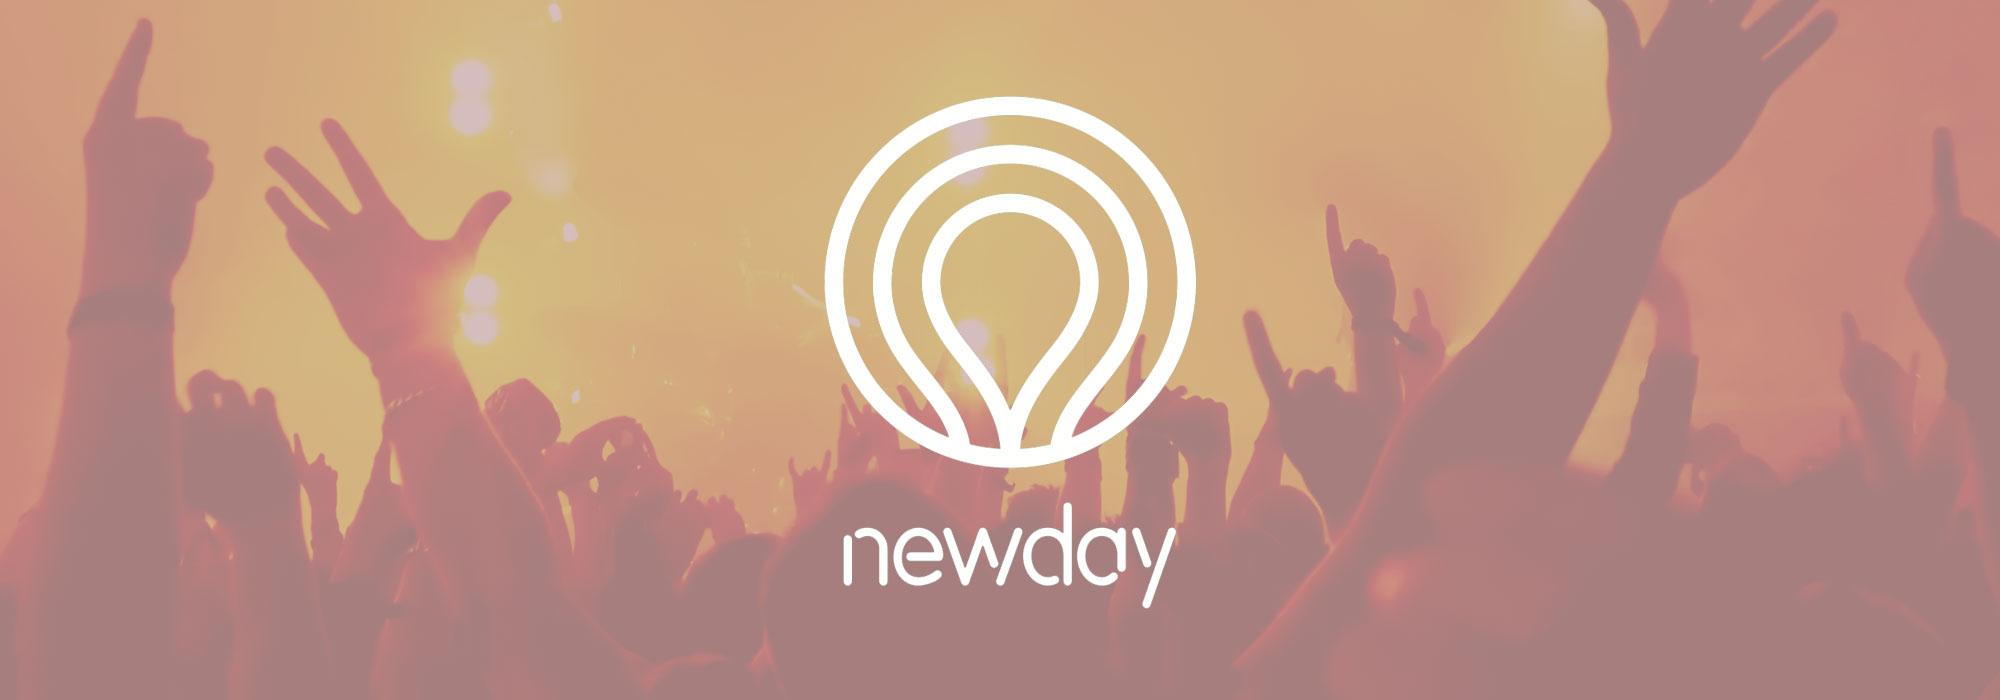 Newday 2018 logo